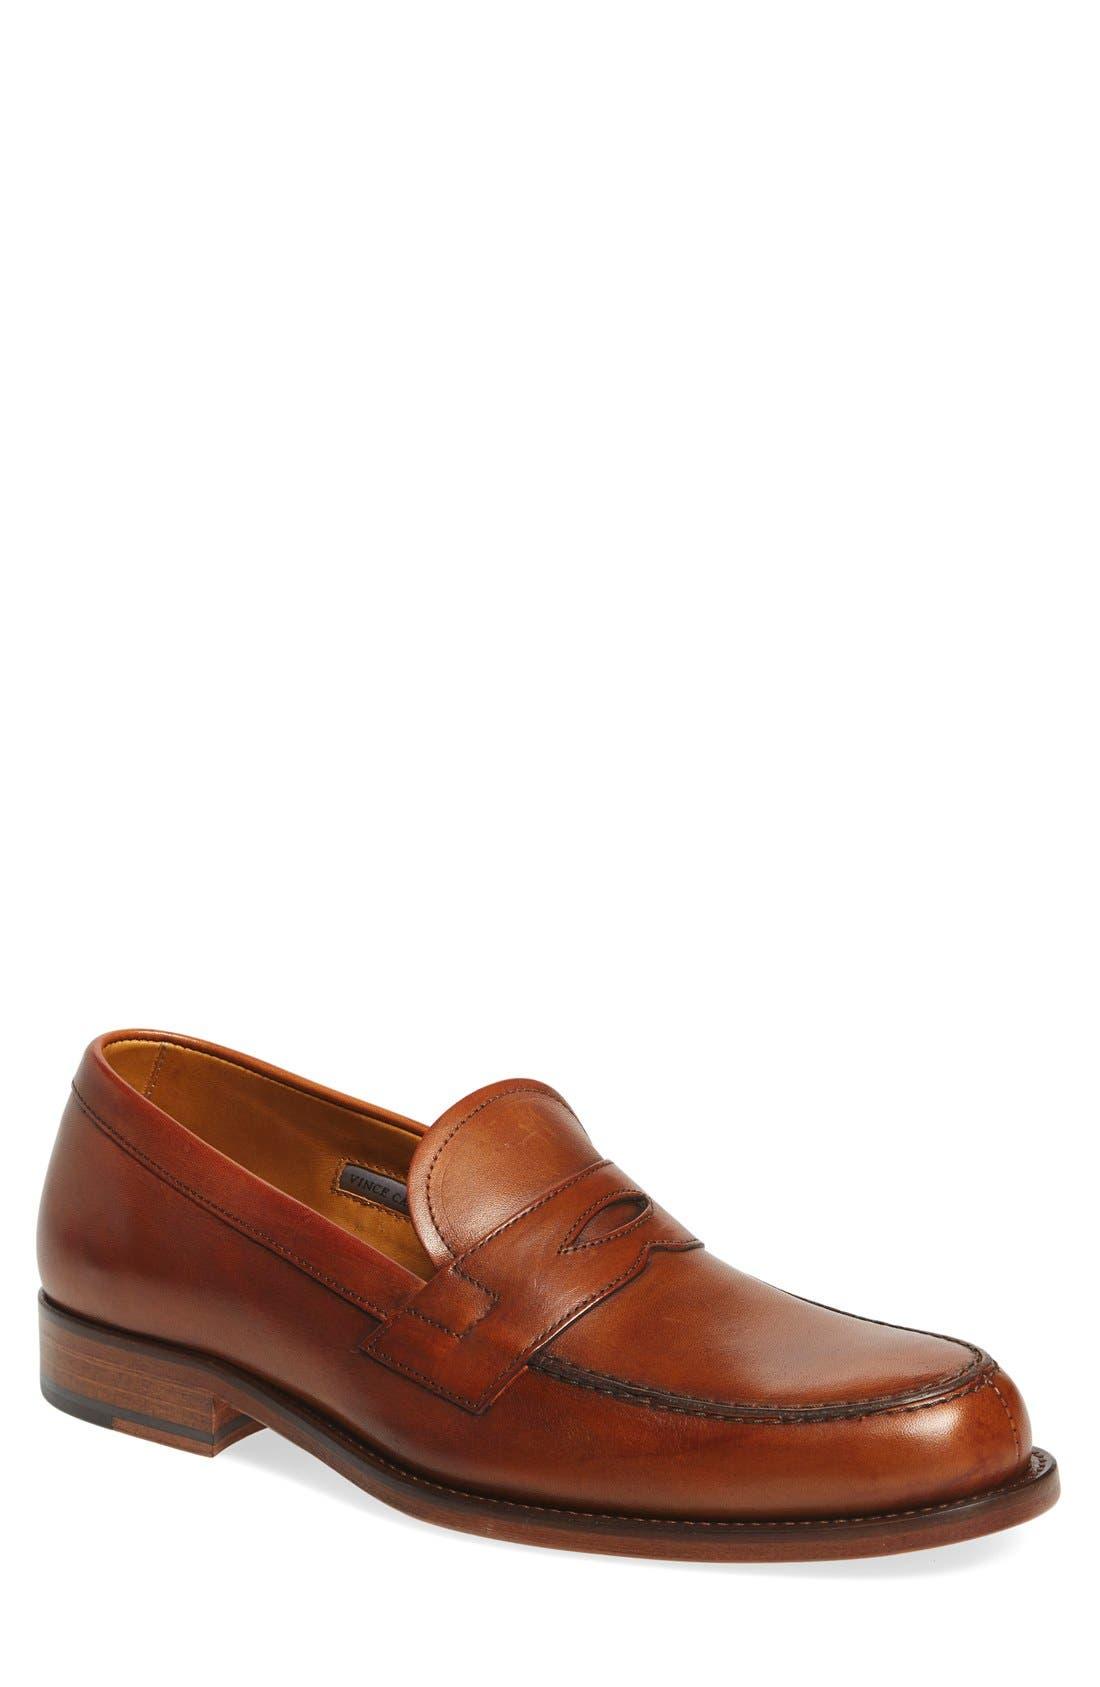 'Nacher' Loafer,                         Main,                         color, Cognac Leather